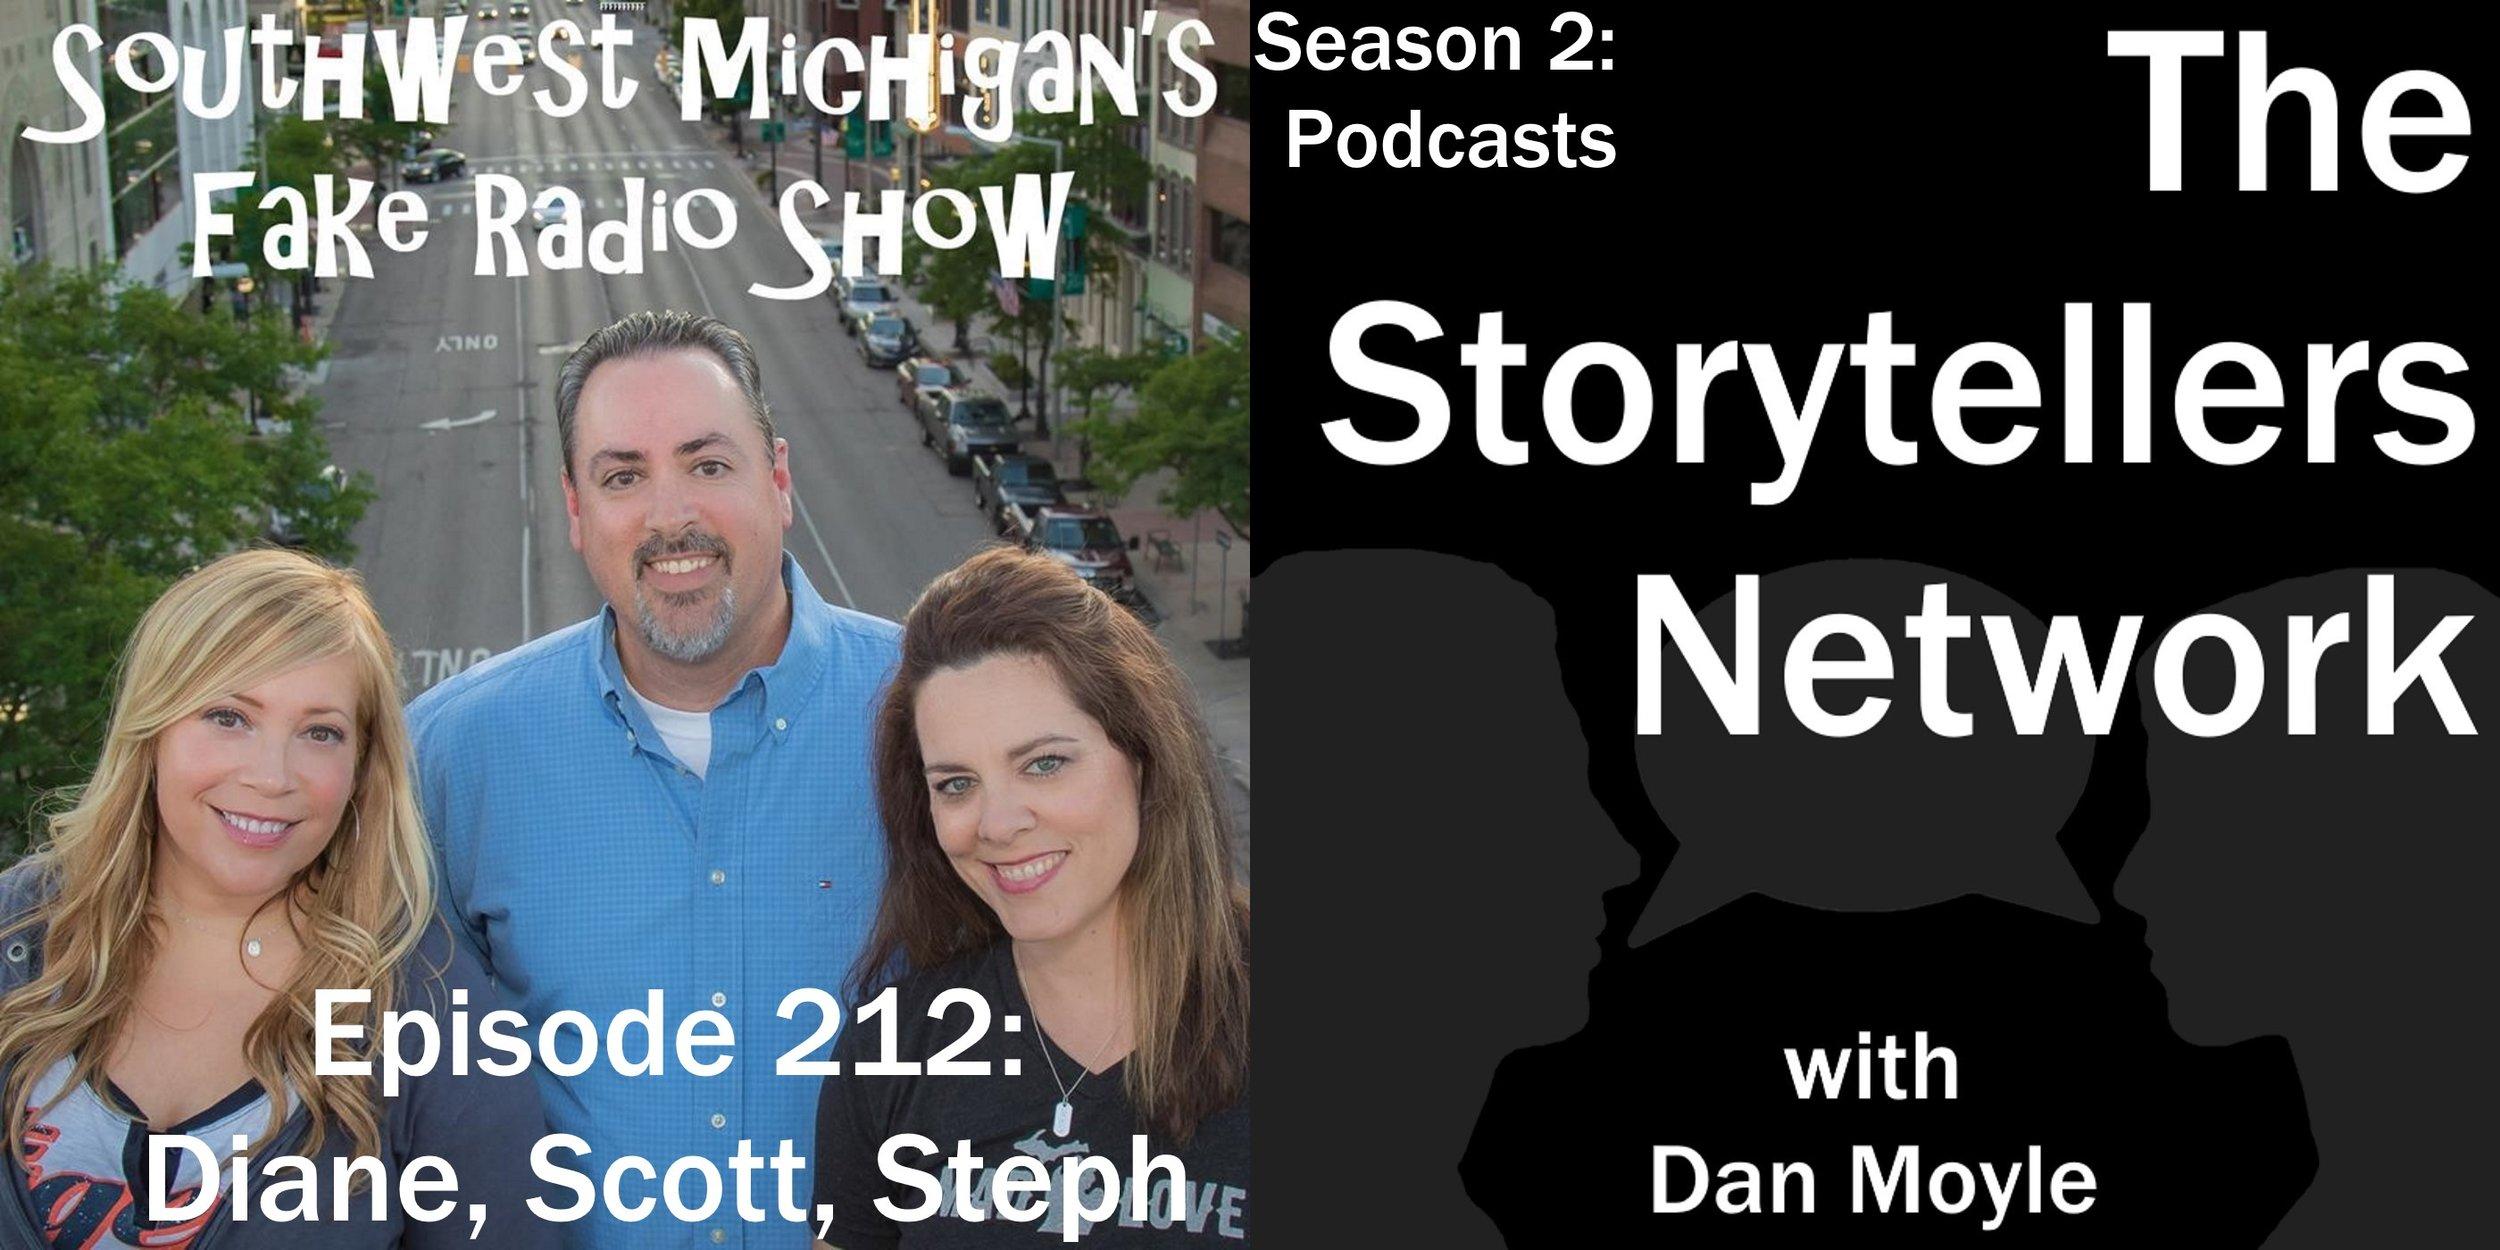 212 Southwest Michigans Fake Radio Show Episode Artwork.jpg